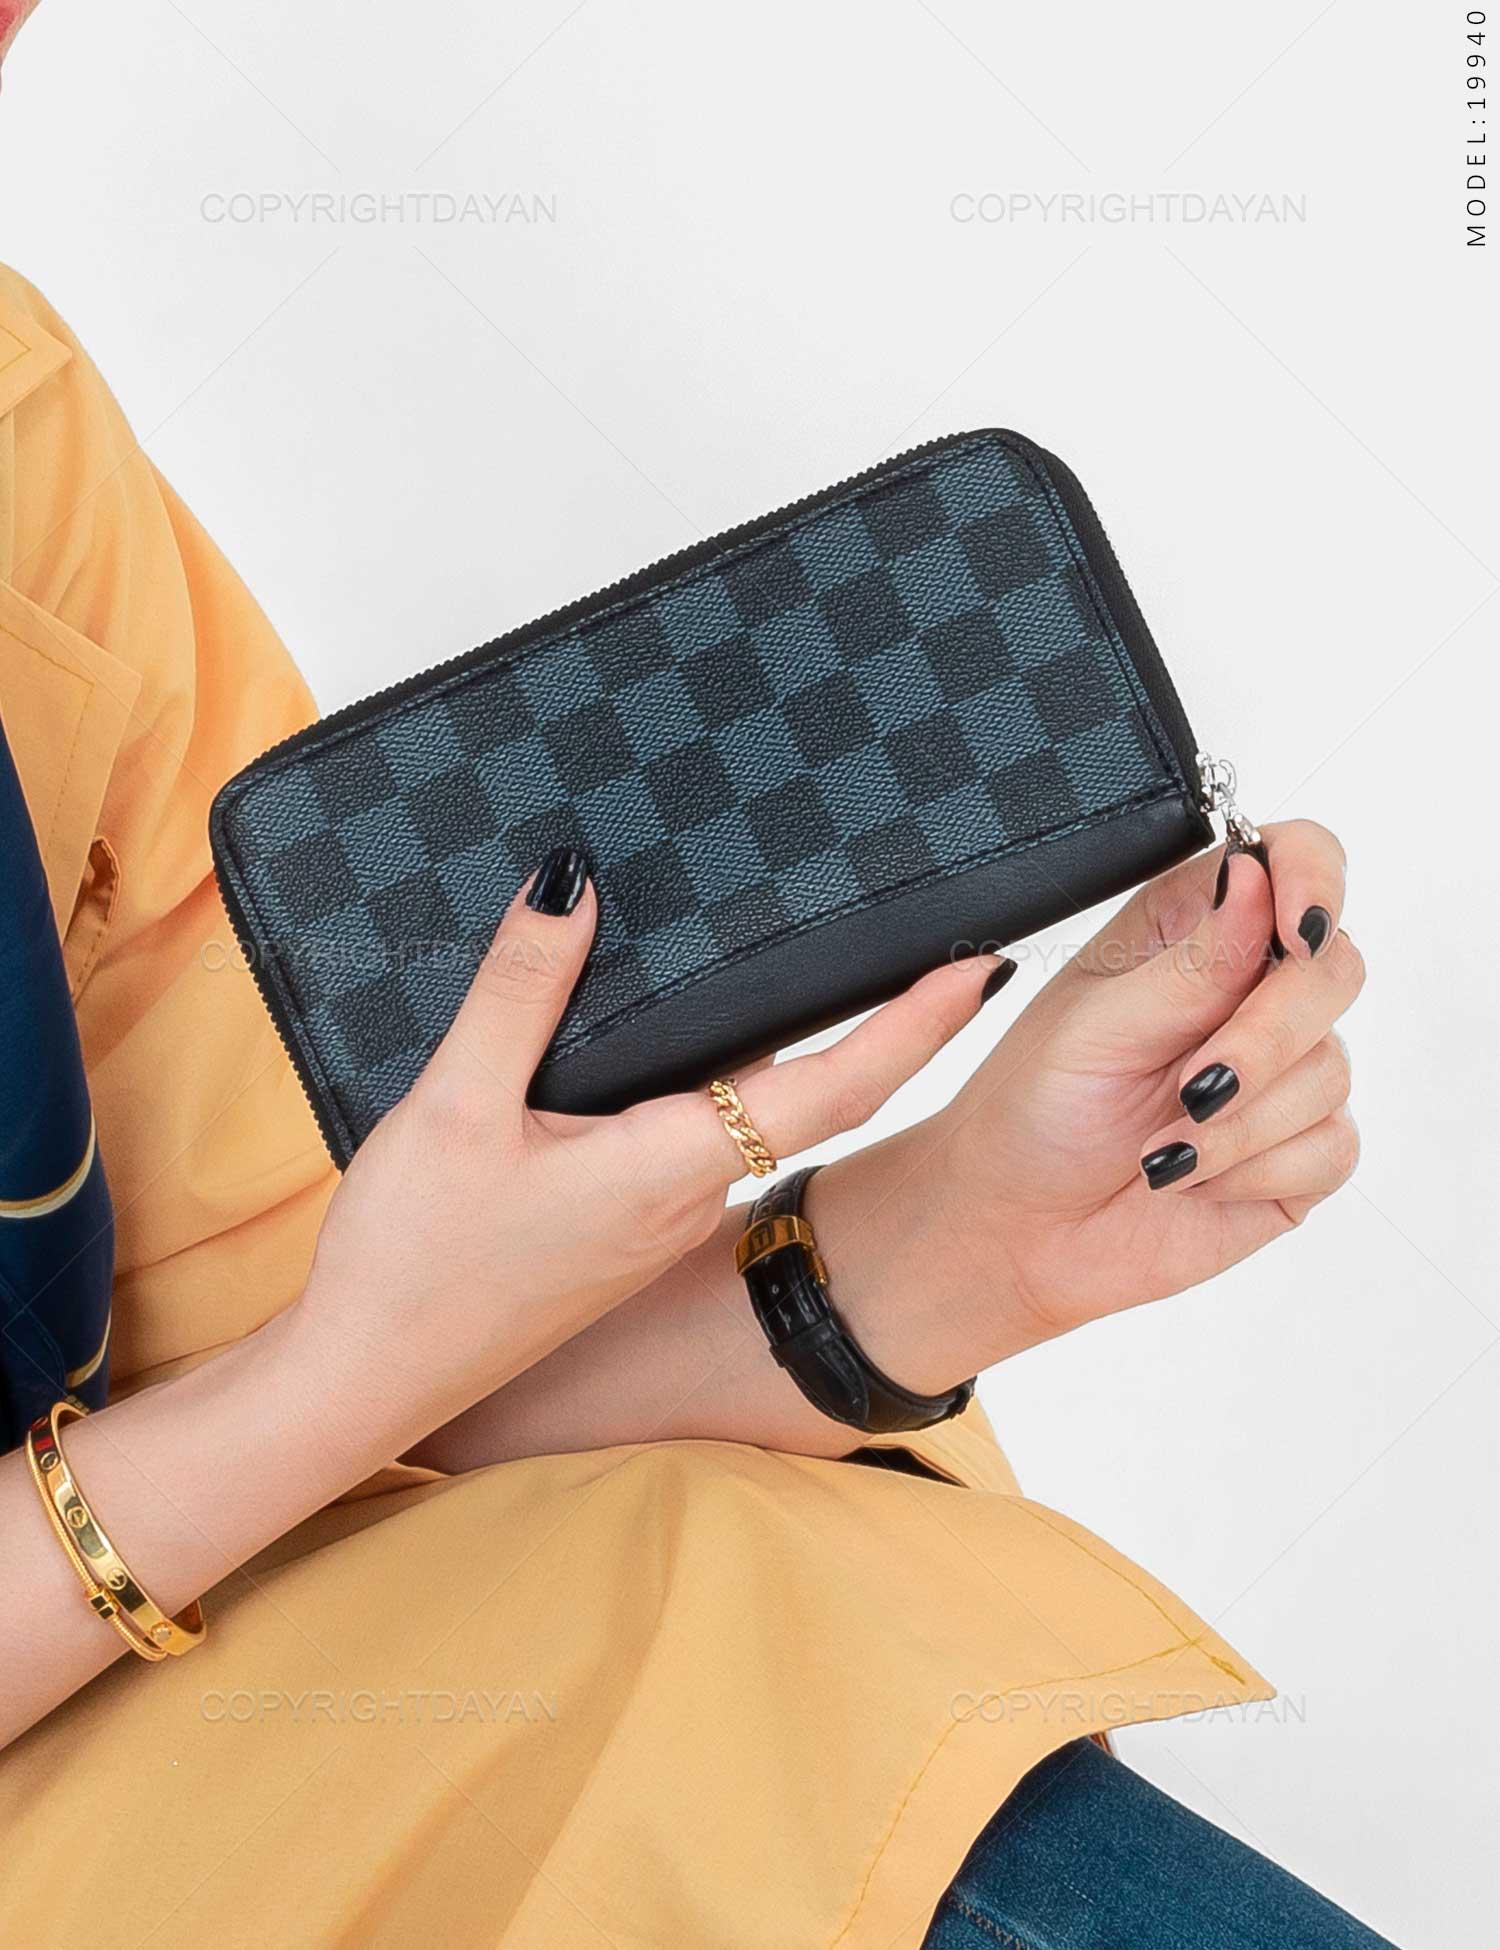 ست سه تیکه زنانه Louis Vuitton مدل 19940 ست سه تیکه زنانه Louis Vuitton مدل 19940 189,000 تومان